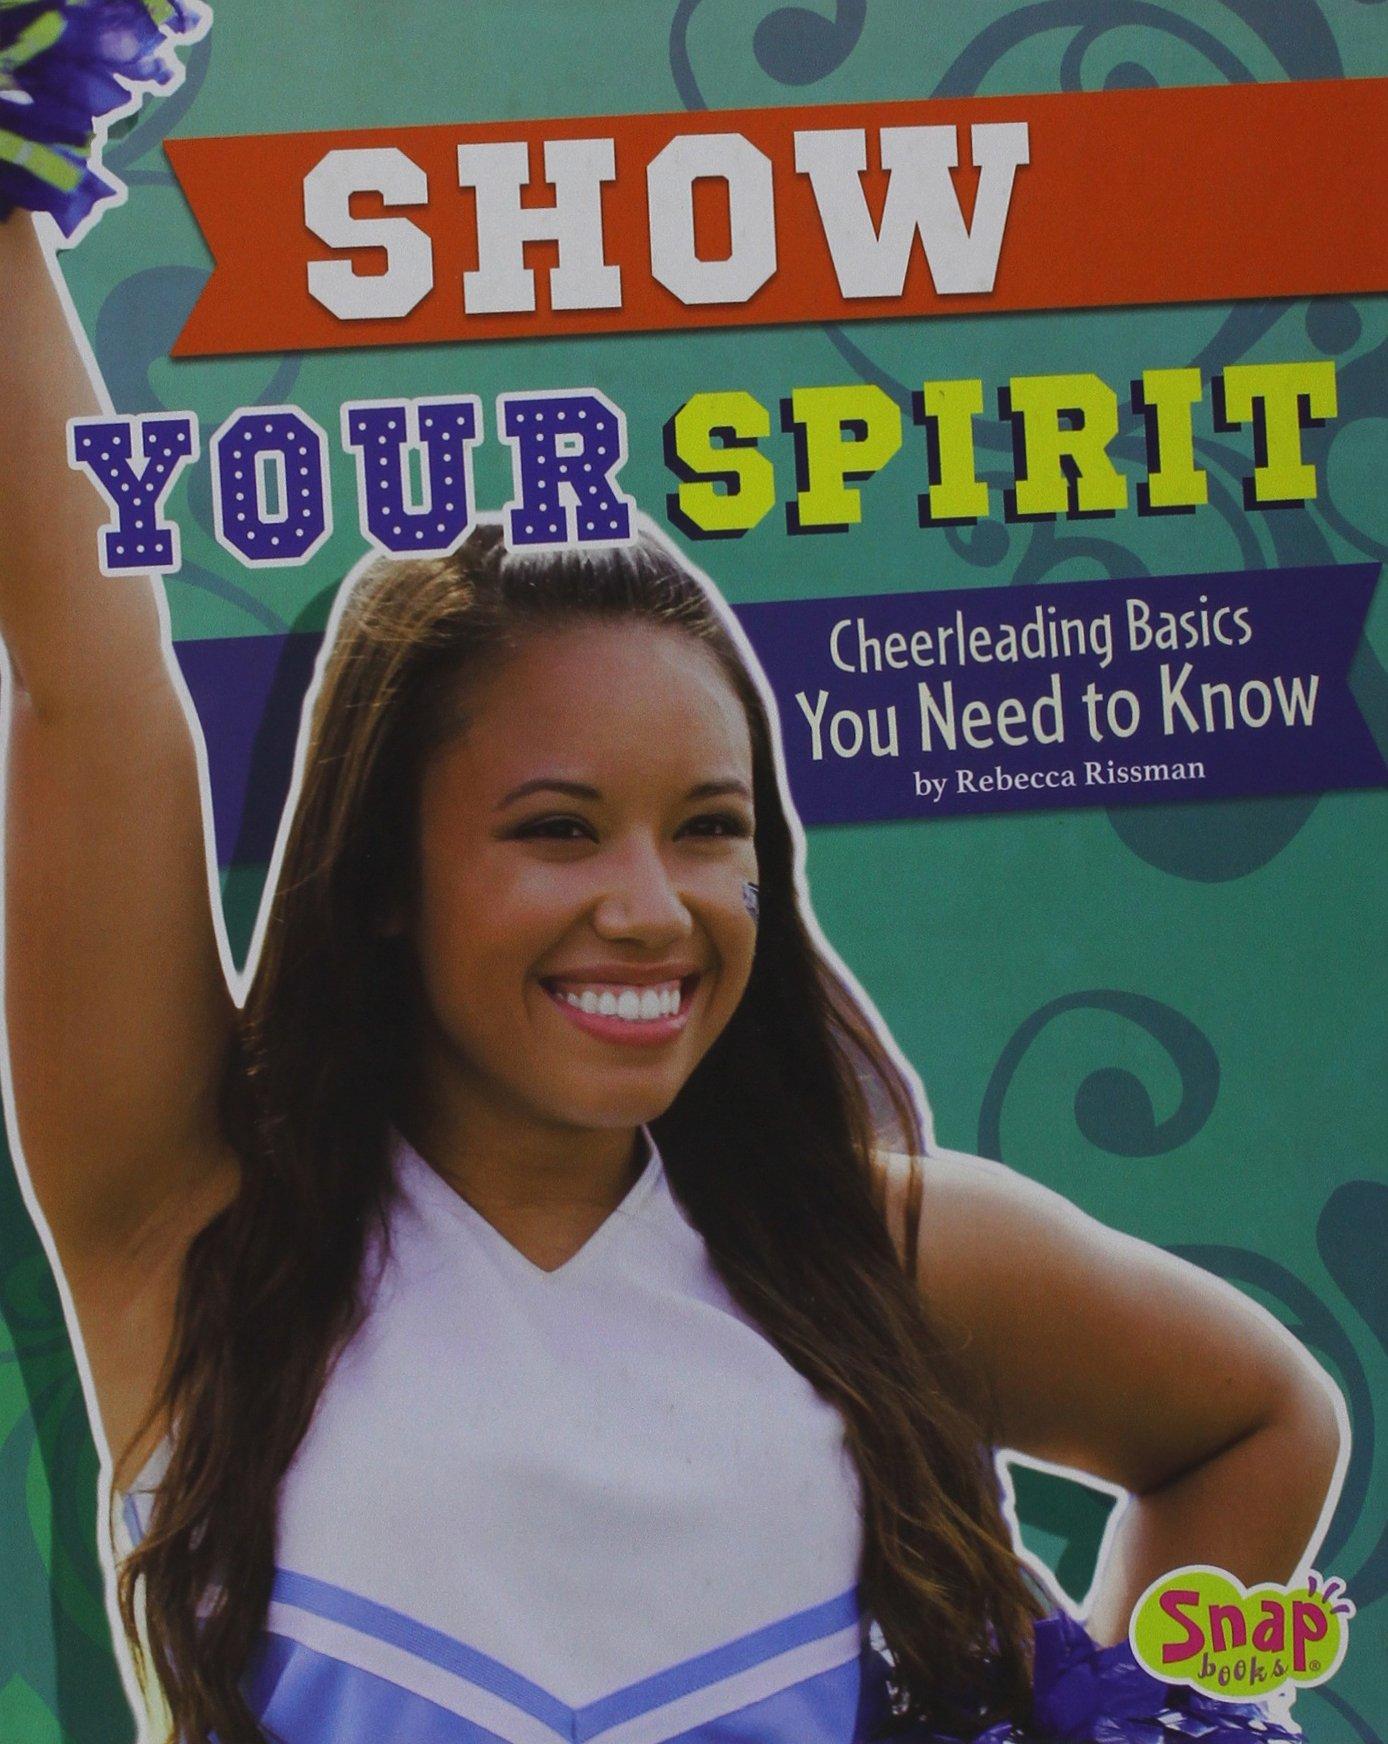 Show Your Spirit: Cheerleading Basics You Need to Know (Cheer Spirit)